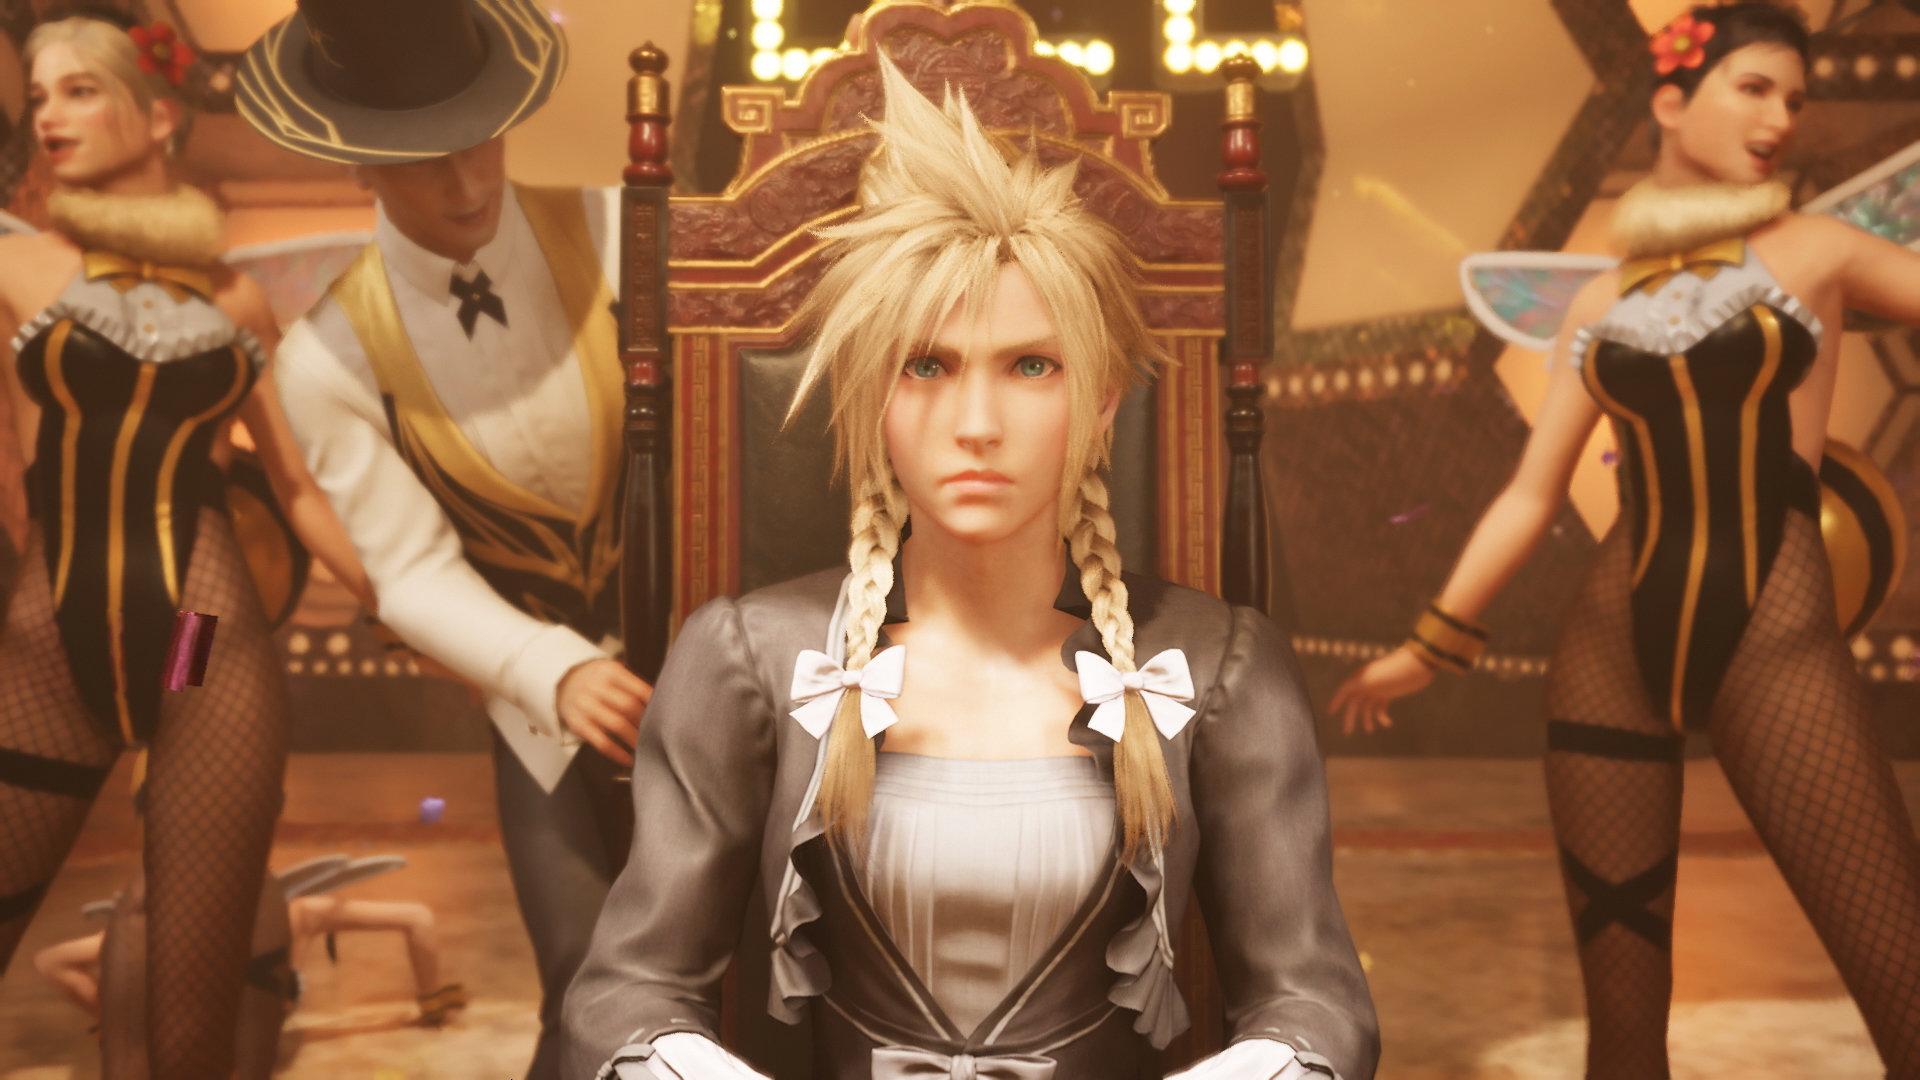 Cloud Strife, the beautiful heroine of Final Fantasy VII.